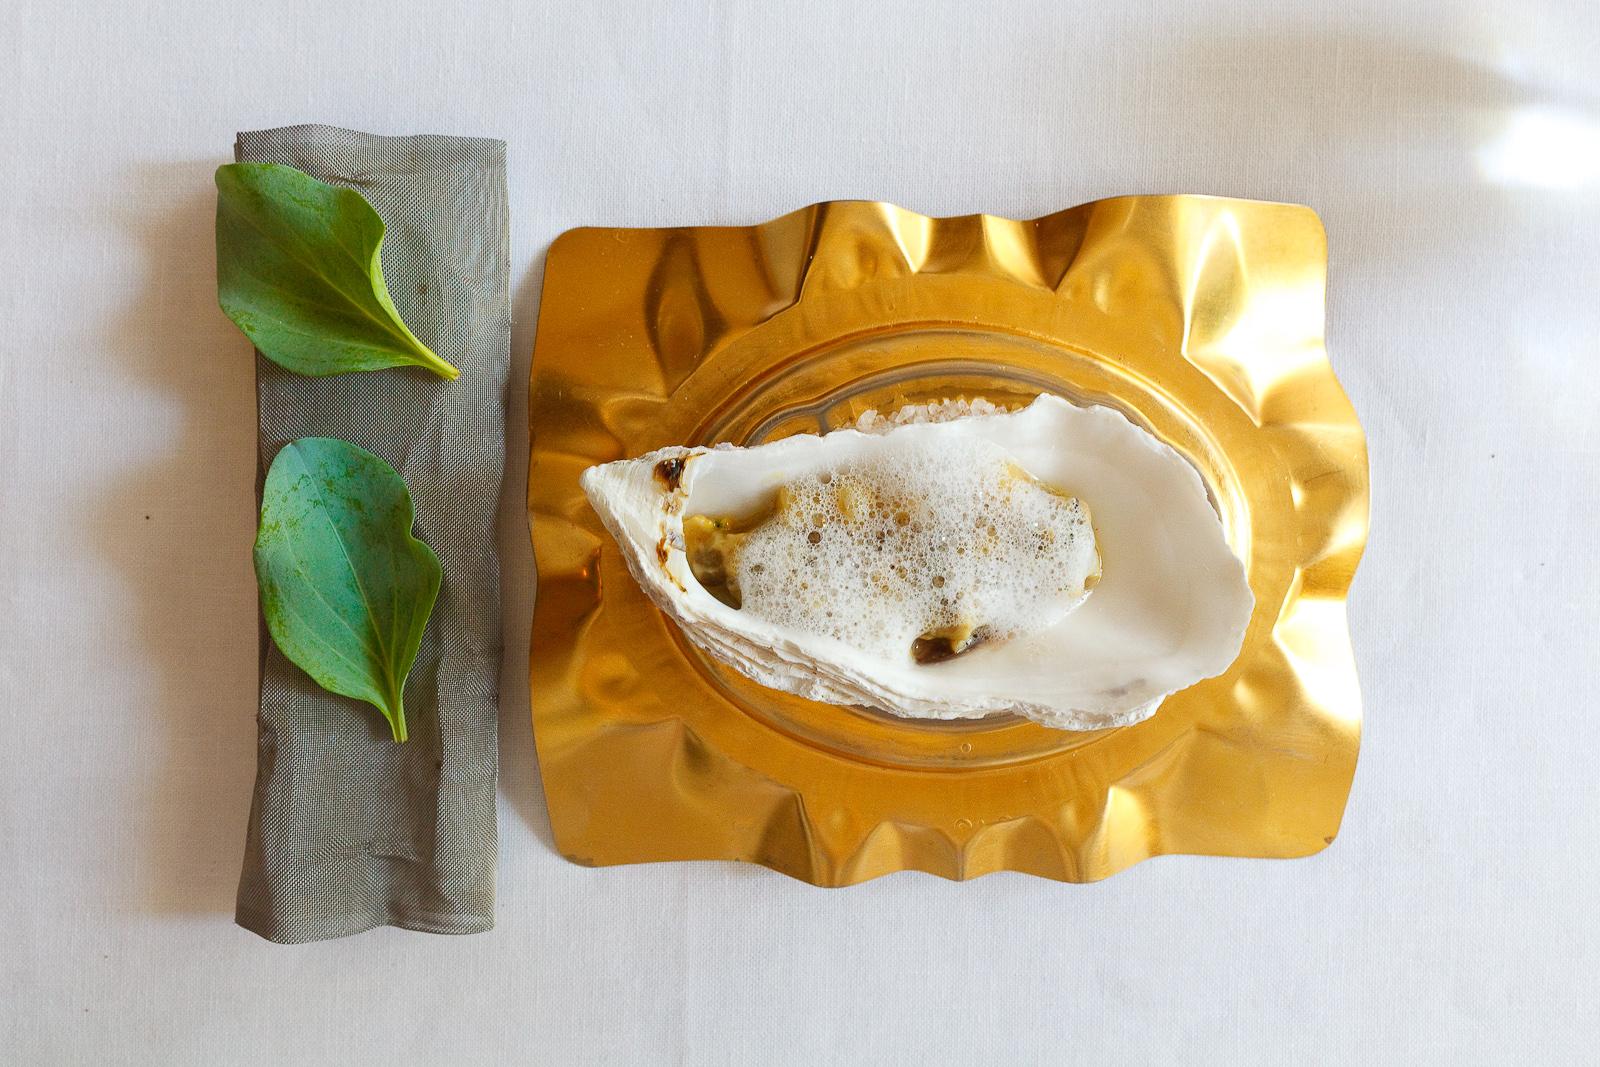 El Bulli, Spain - 20th Course: Oysters and bone marrow tartar